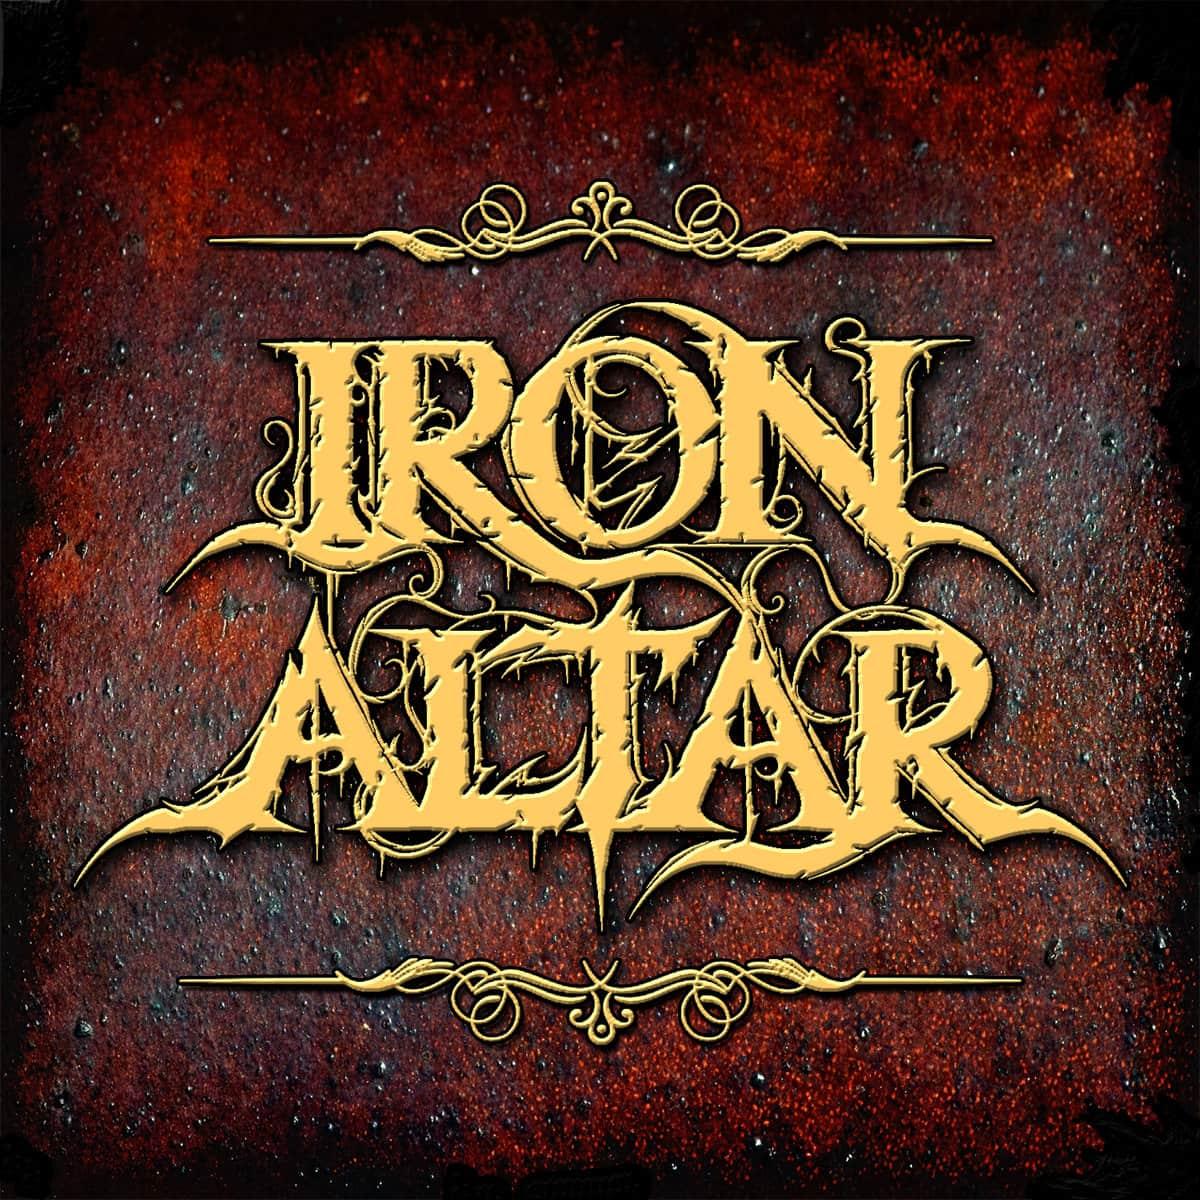 Iron Altar - Iron Altar